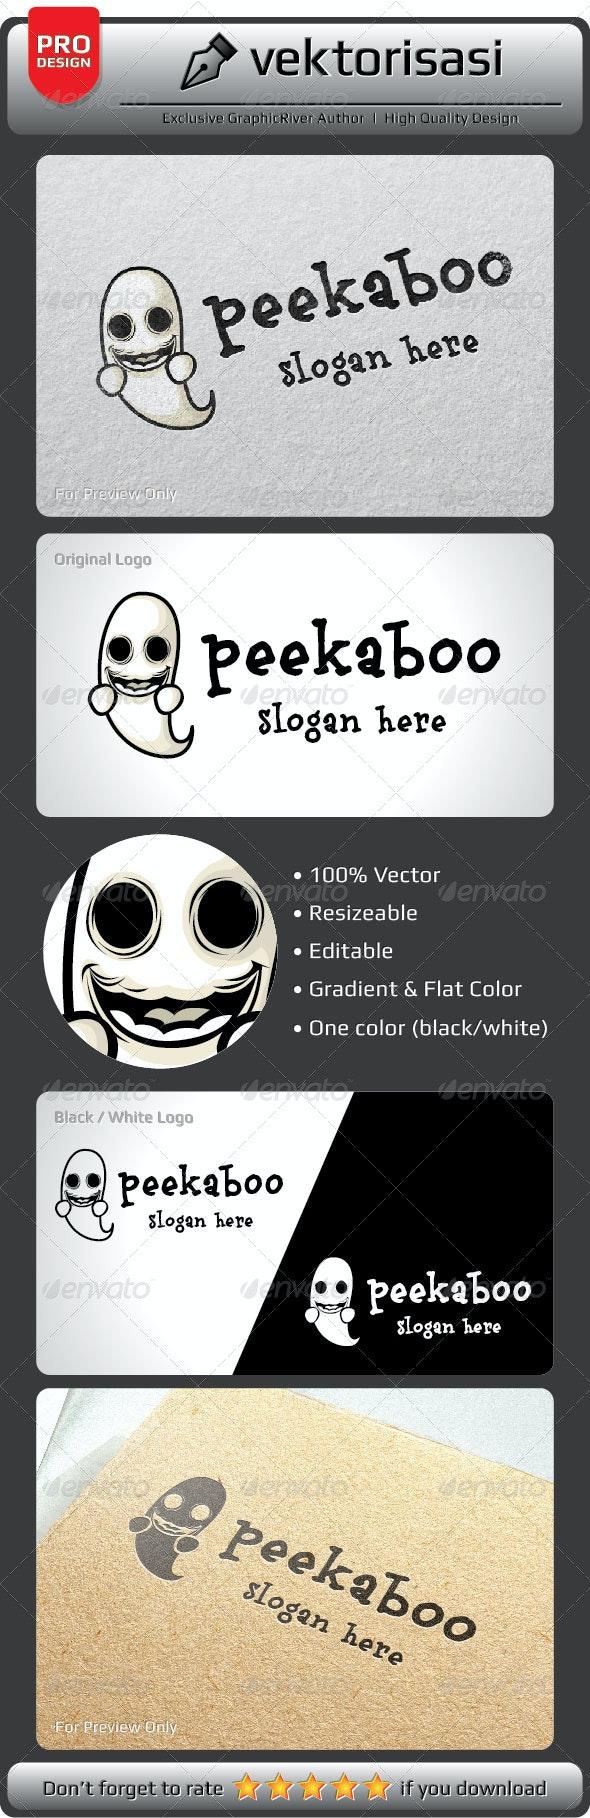 Peekaboo Logo